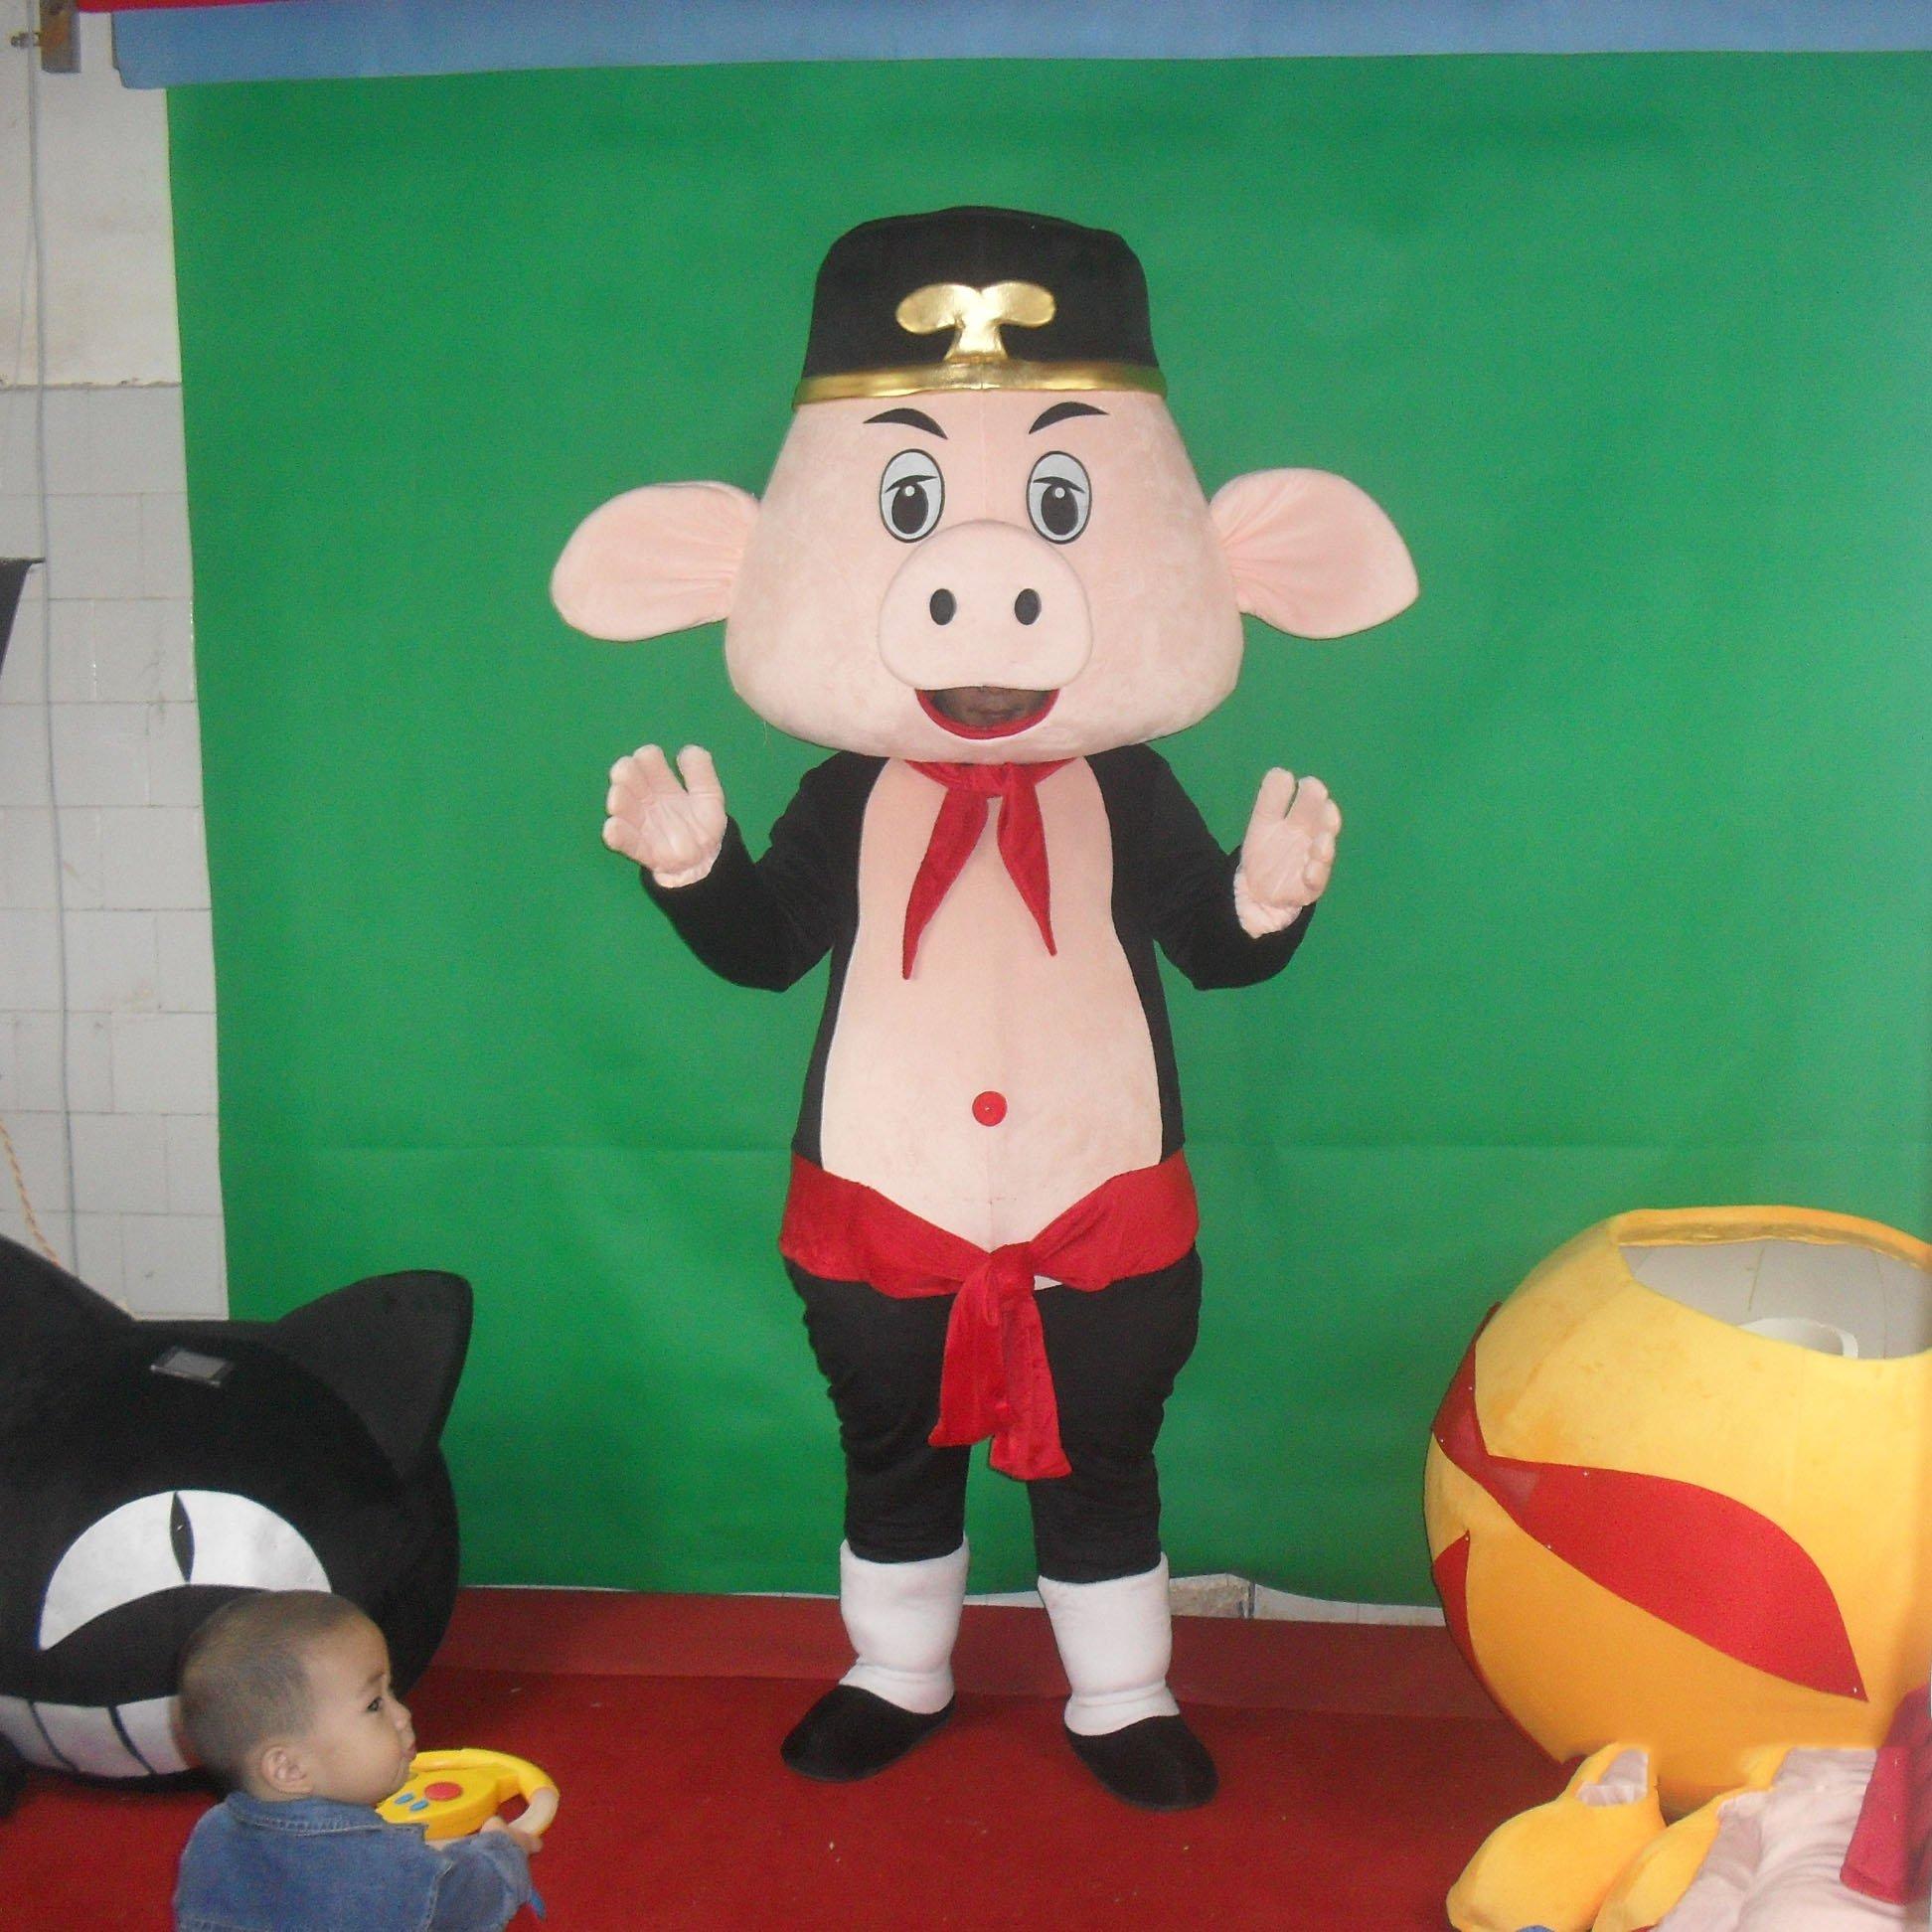 Pig Cartoon Dolls Walking Cartoon Doll Clothing Cartoon Dolls Dress Costumes Mascot Costume